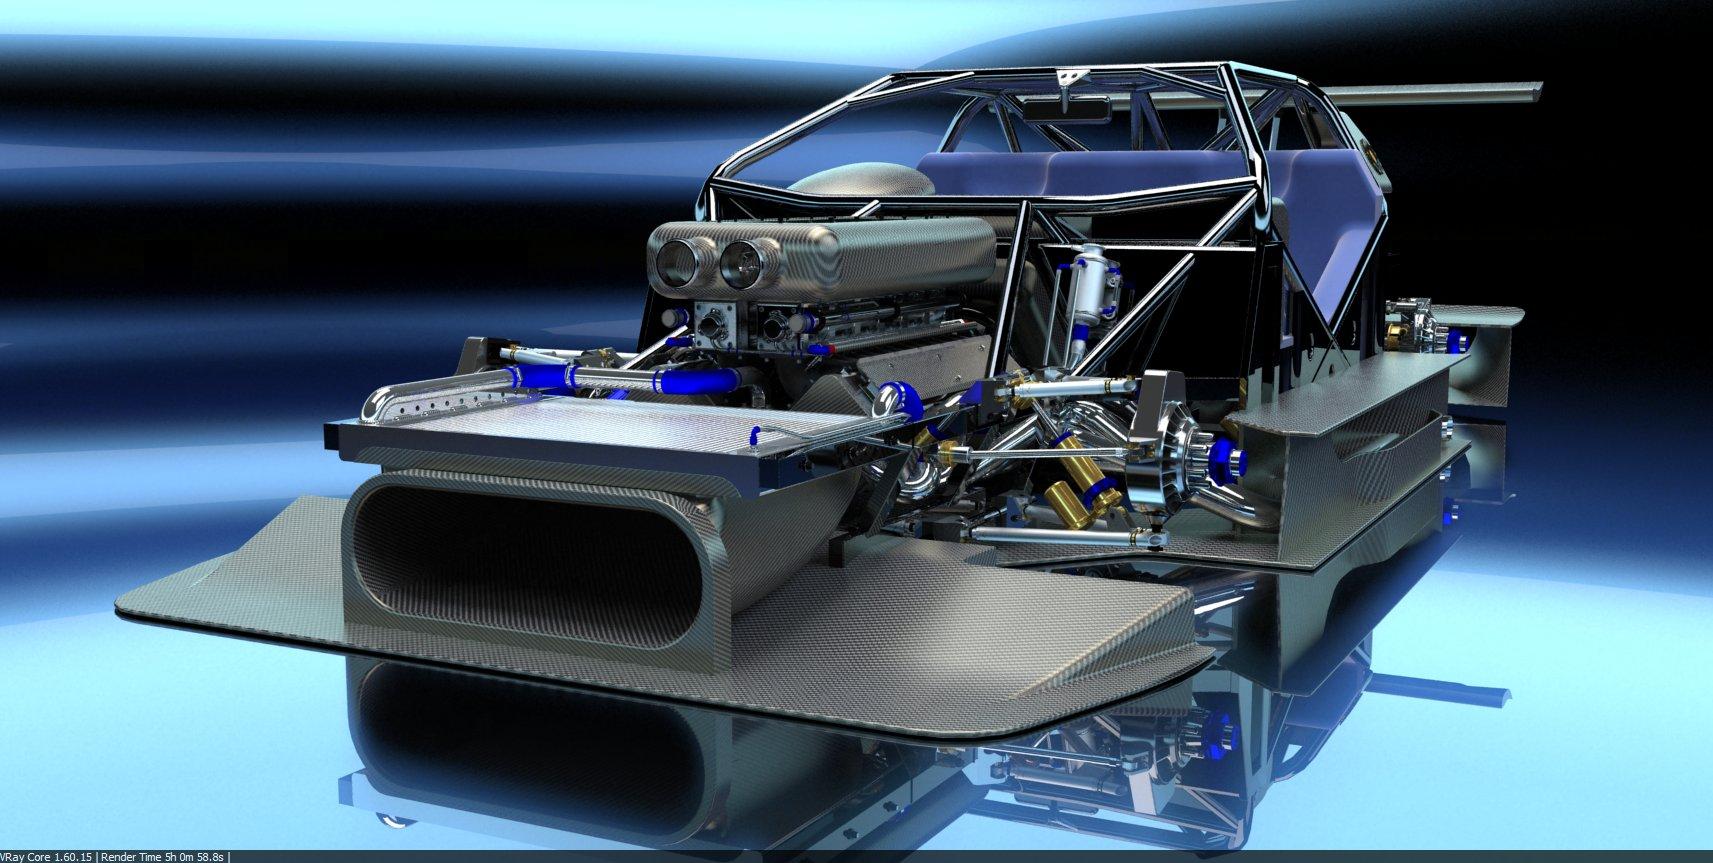 PEASNELL RACING DESIGN 575 GTC HILLCLIMB CAR DETAIL (6)